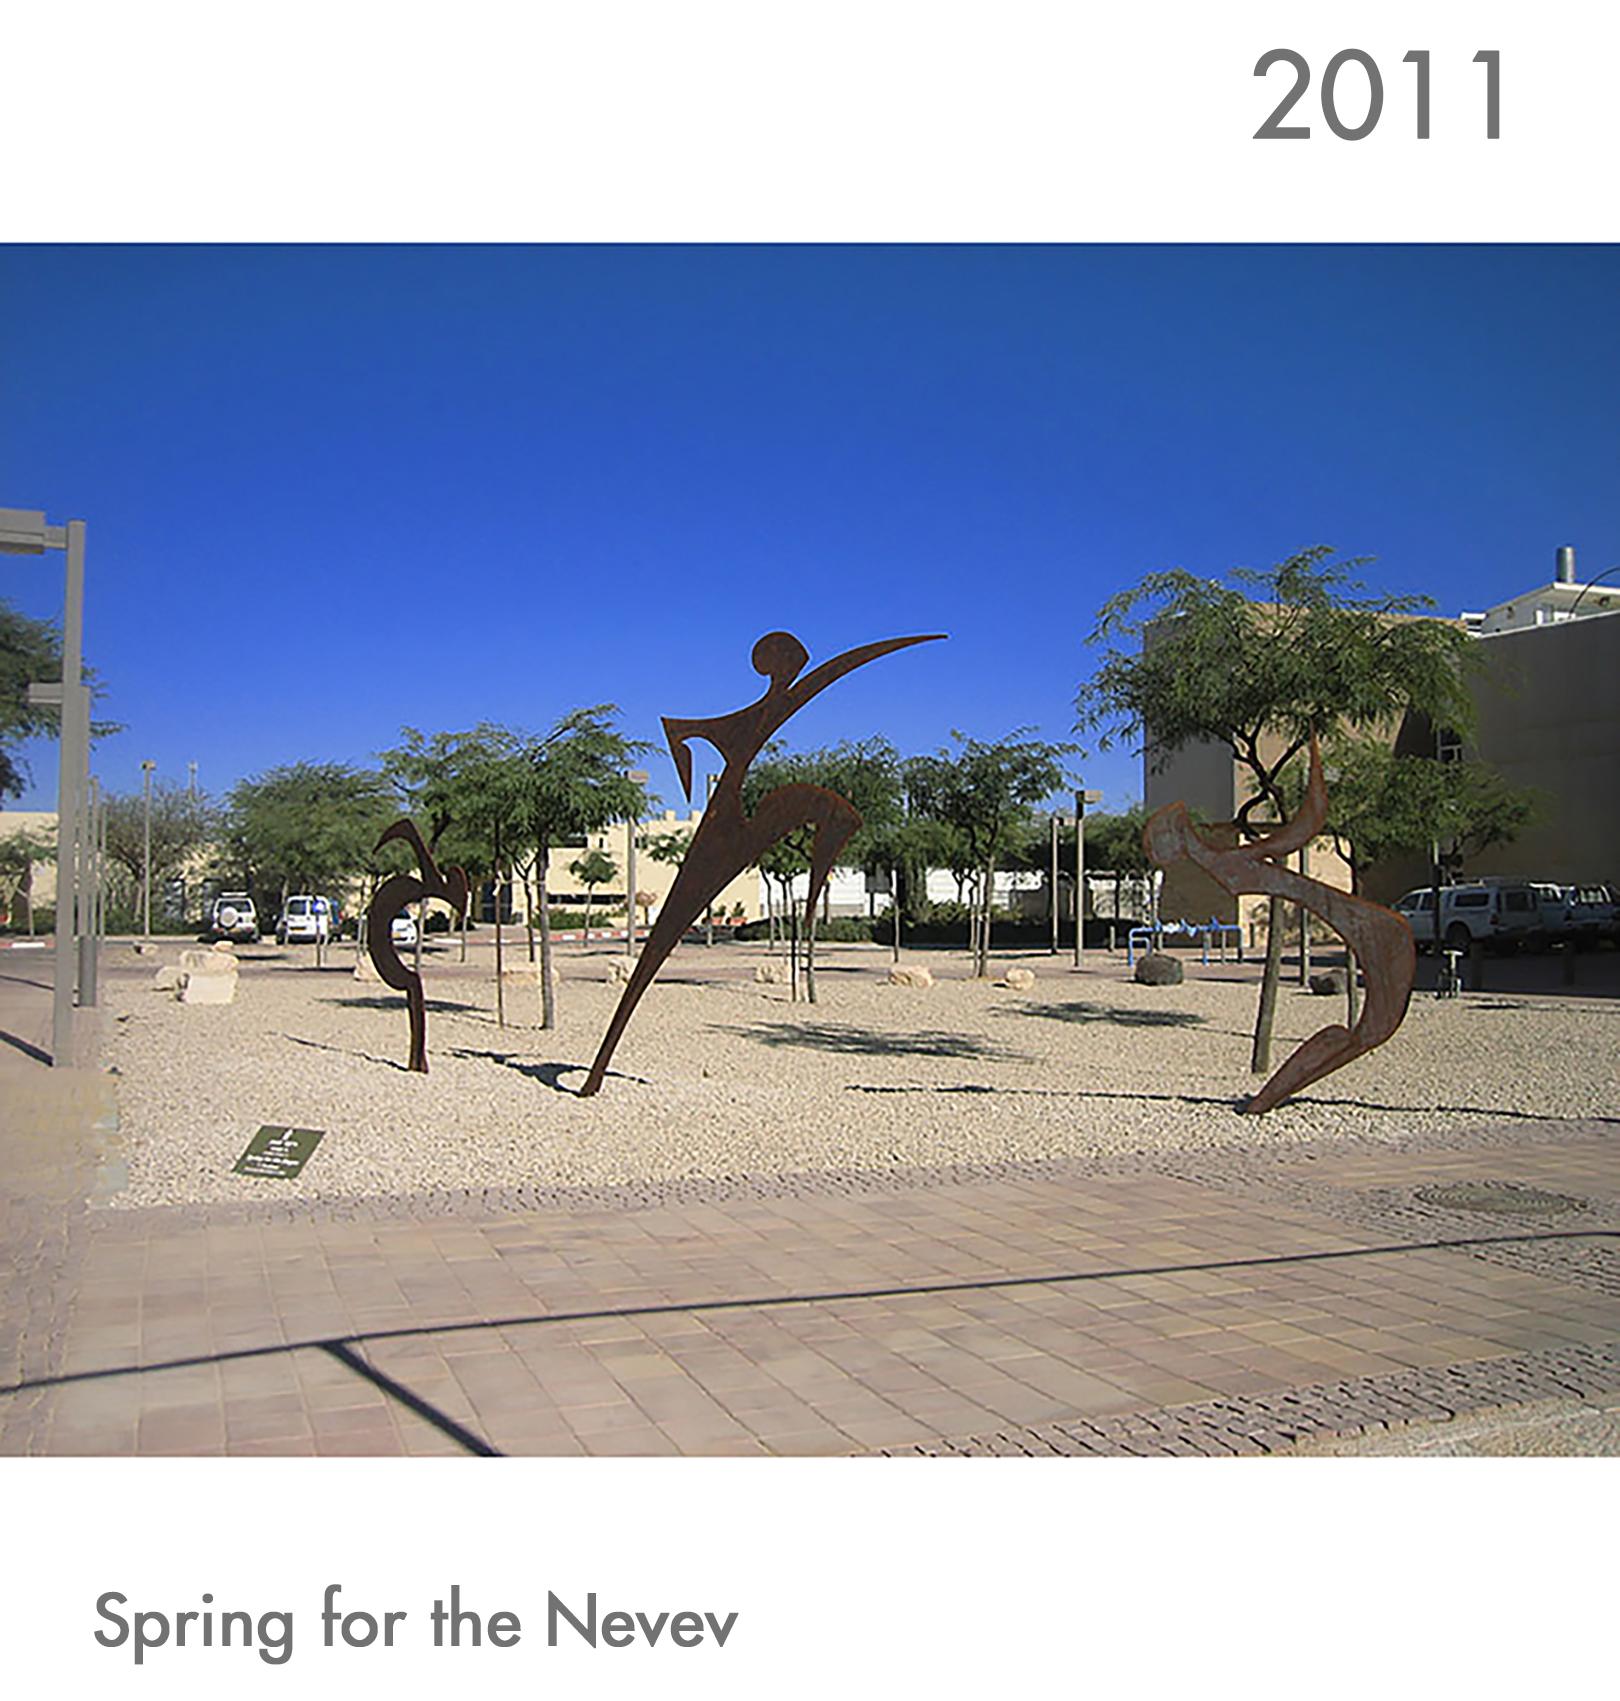 2011 Spring for the Negev copy2.jpg